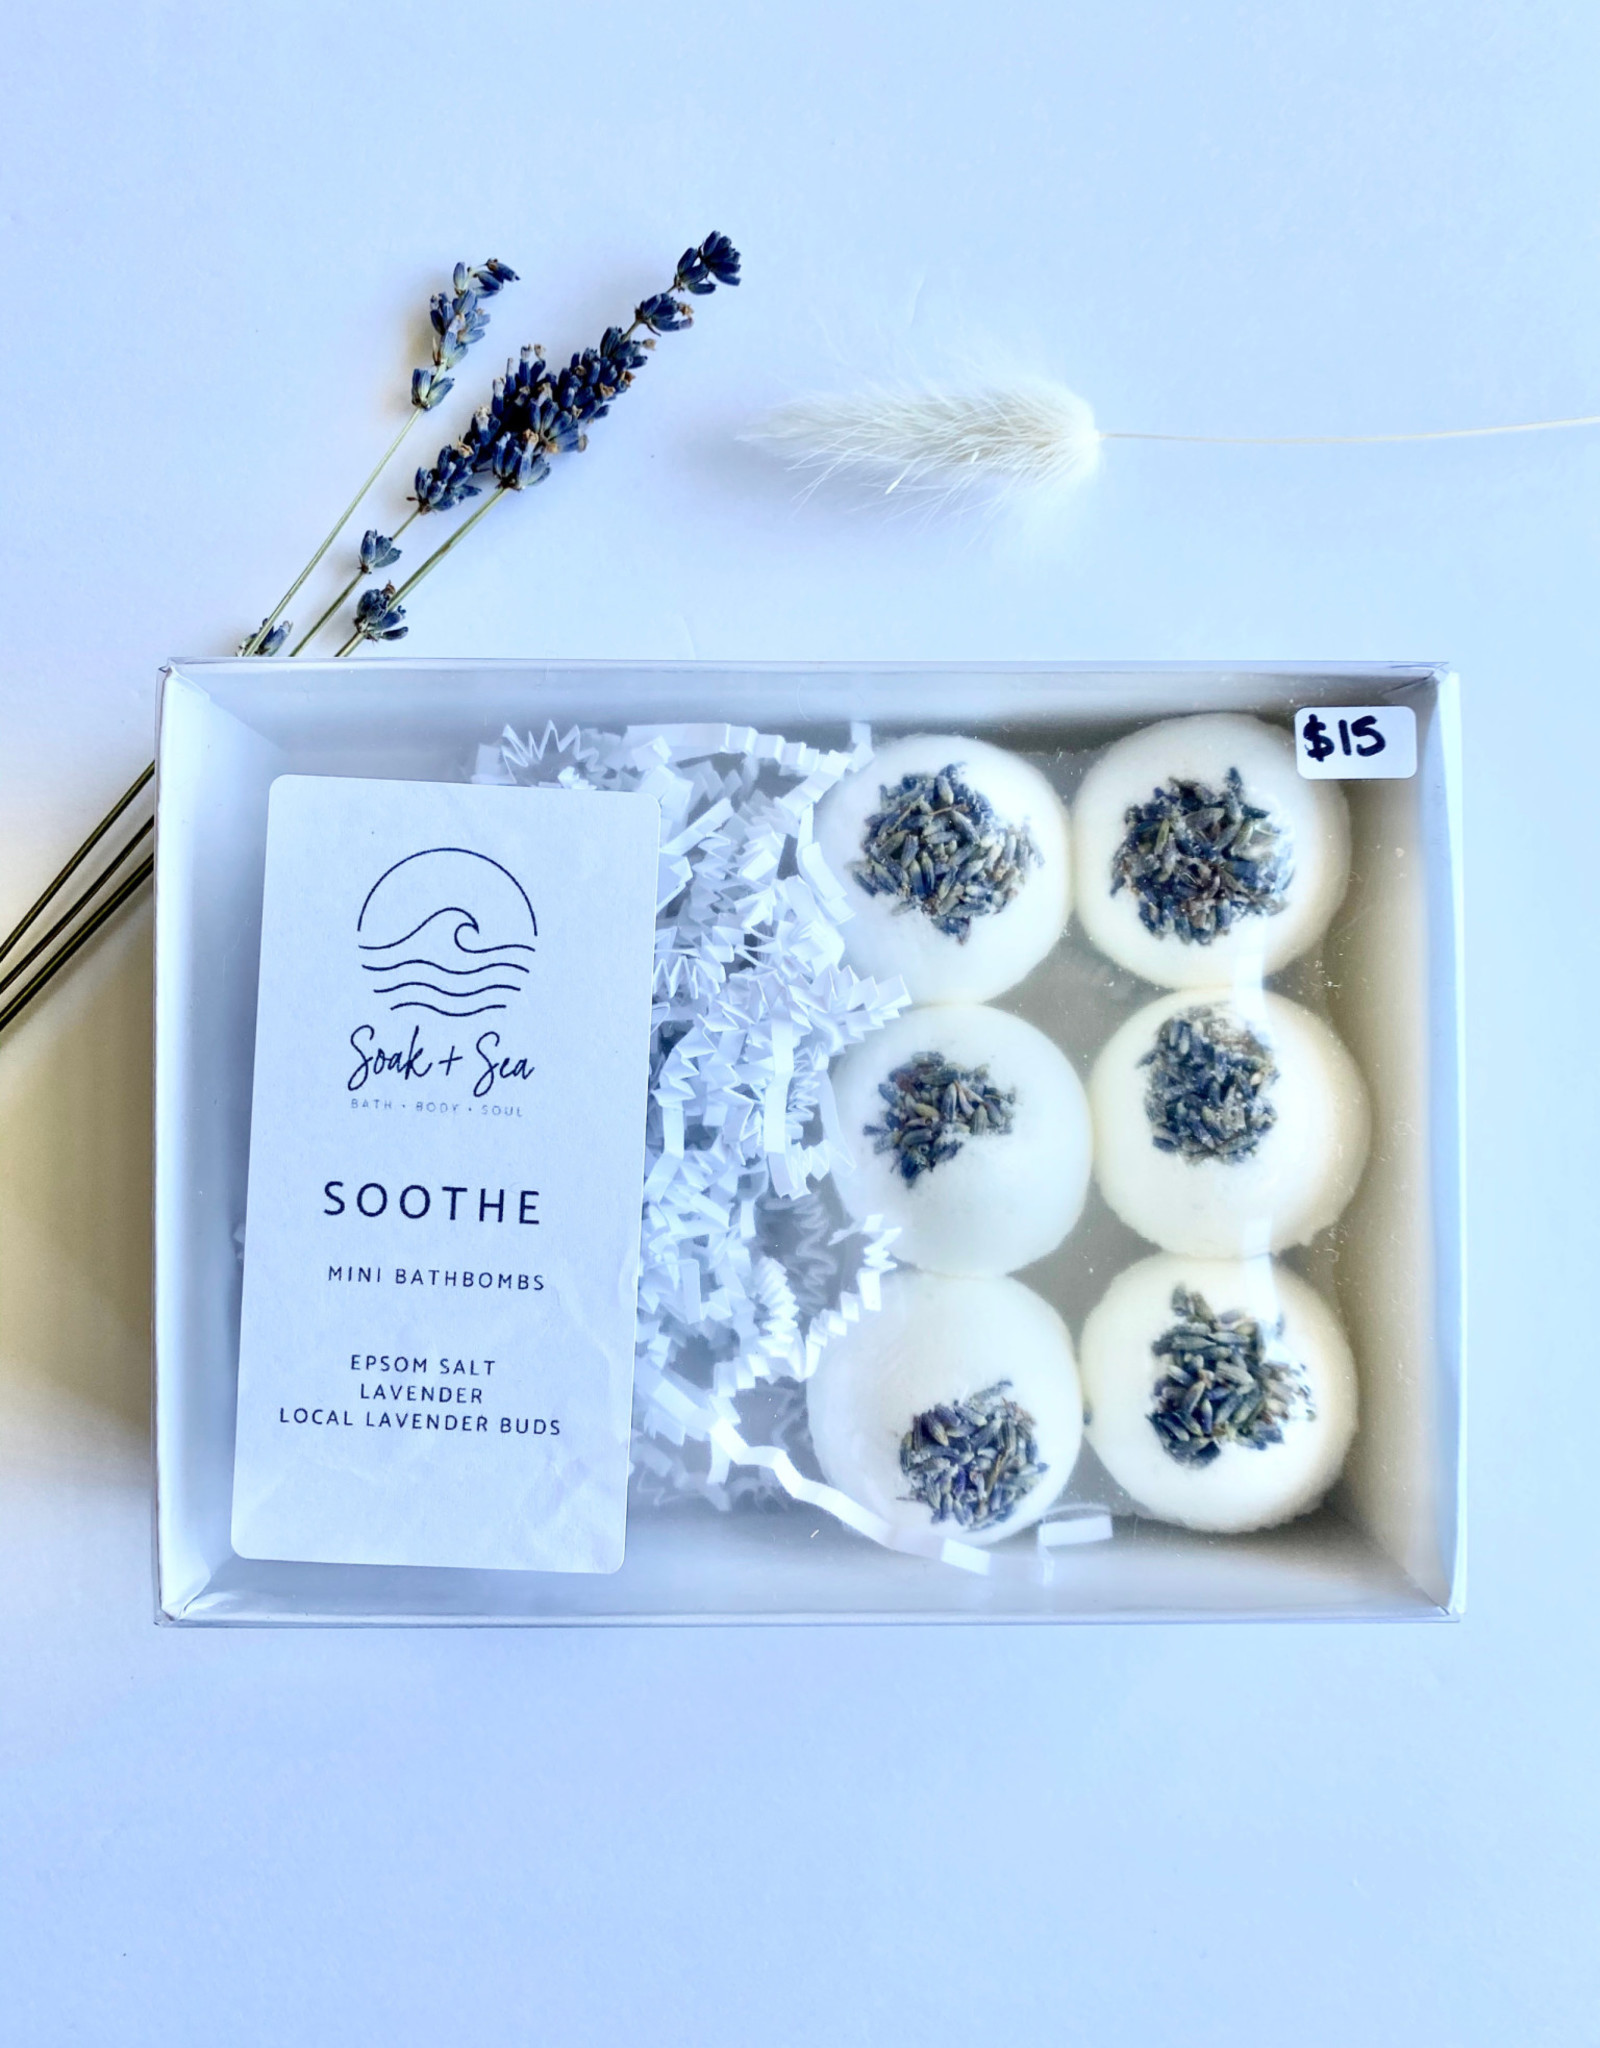 Soak and Sea Soak & Sea Soothe, Mini Bathbomb Sets